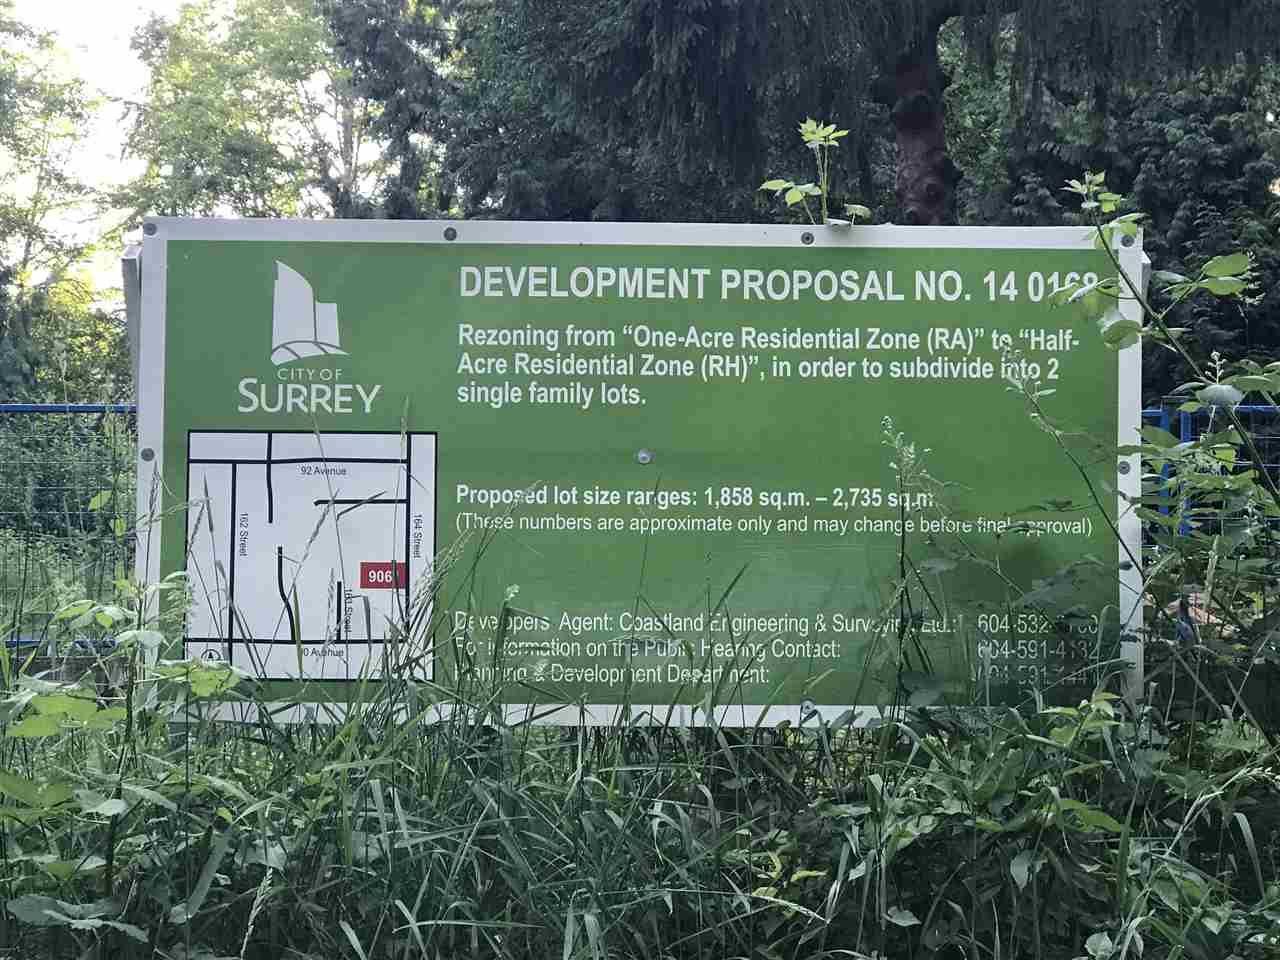 Main Photo: LT.1 9061 164 Street in Surrey: Fleetwood Tynehead Land for sale : MLS®# R2178210